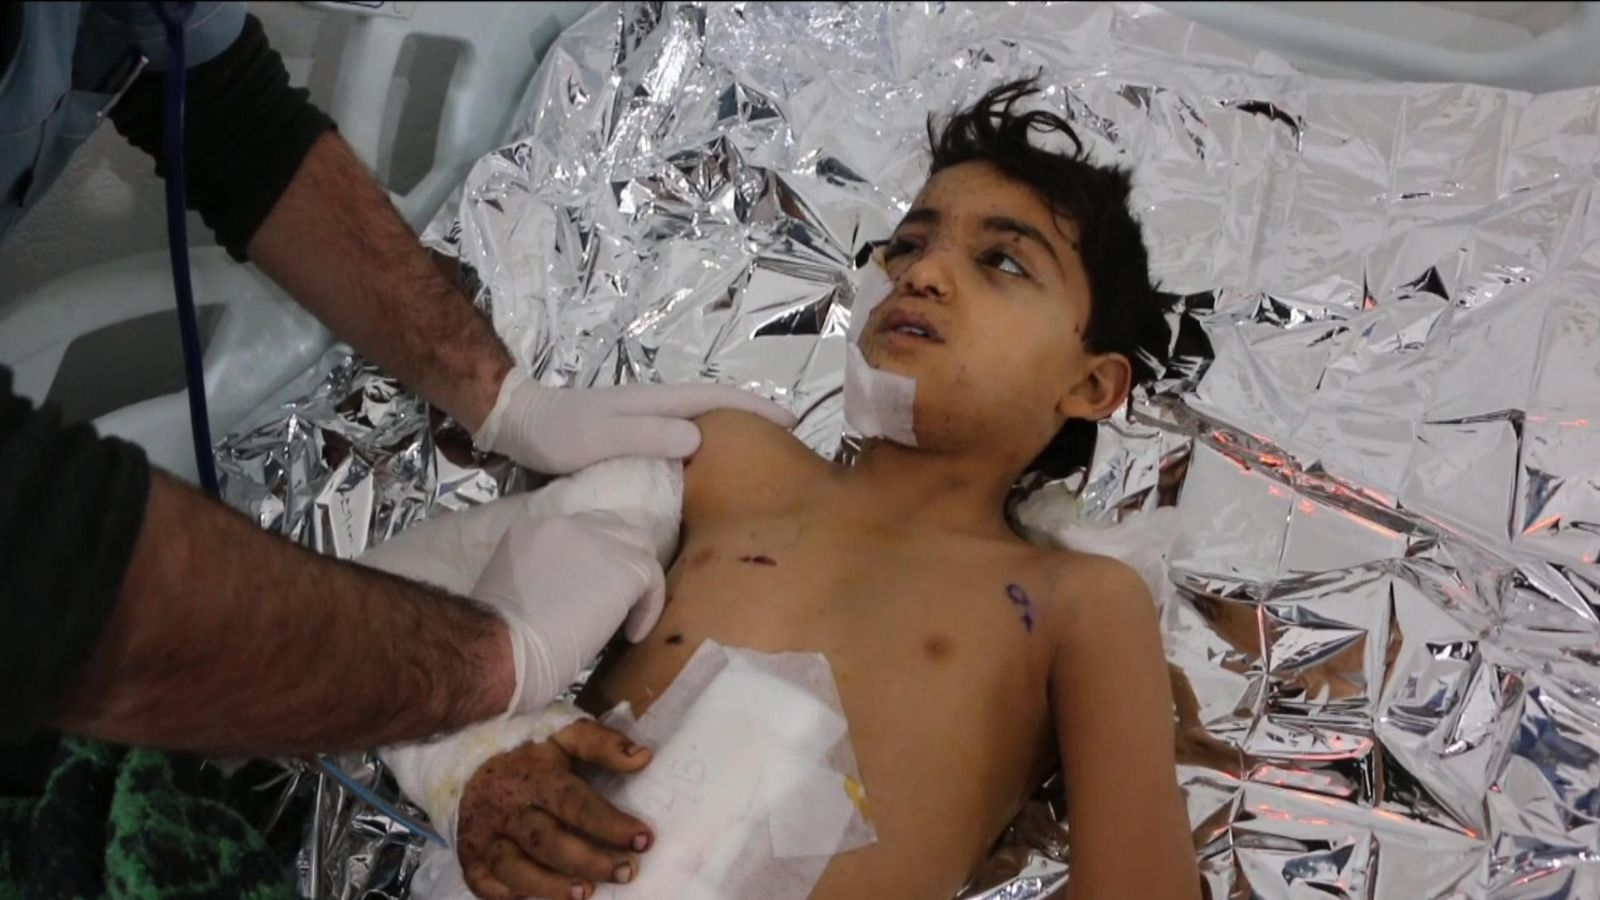 Child survivor of Idlib bombing: 'May Allah kill Assad and Russia'